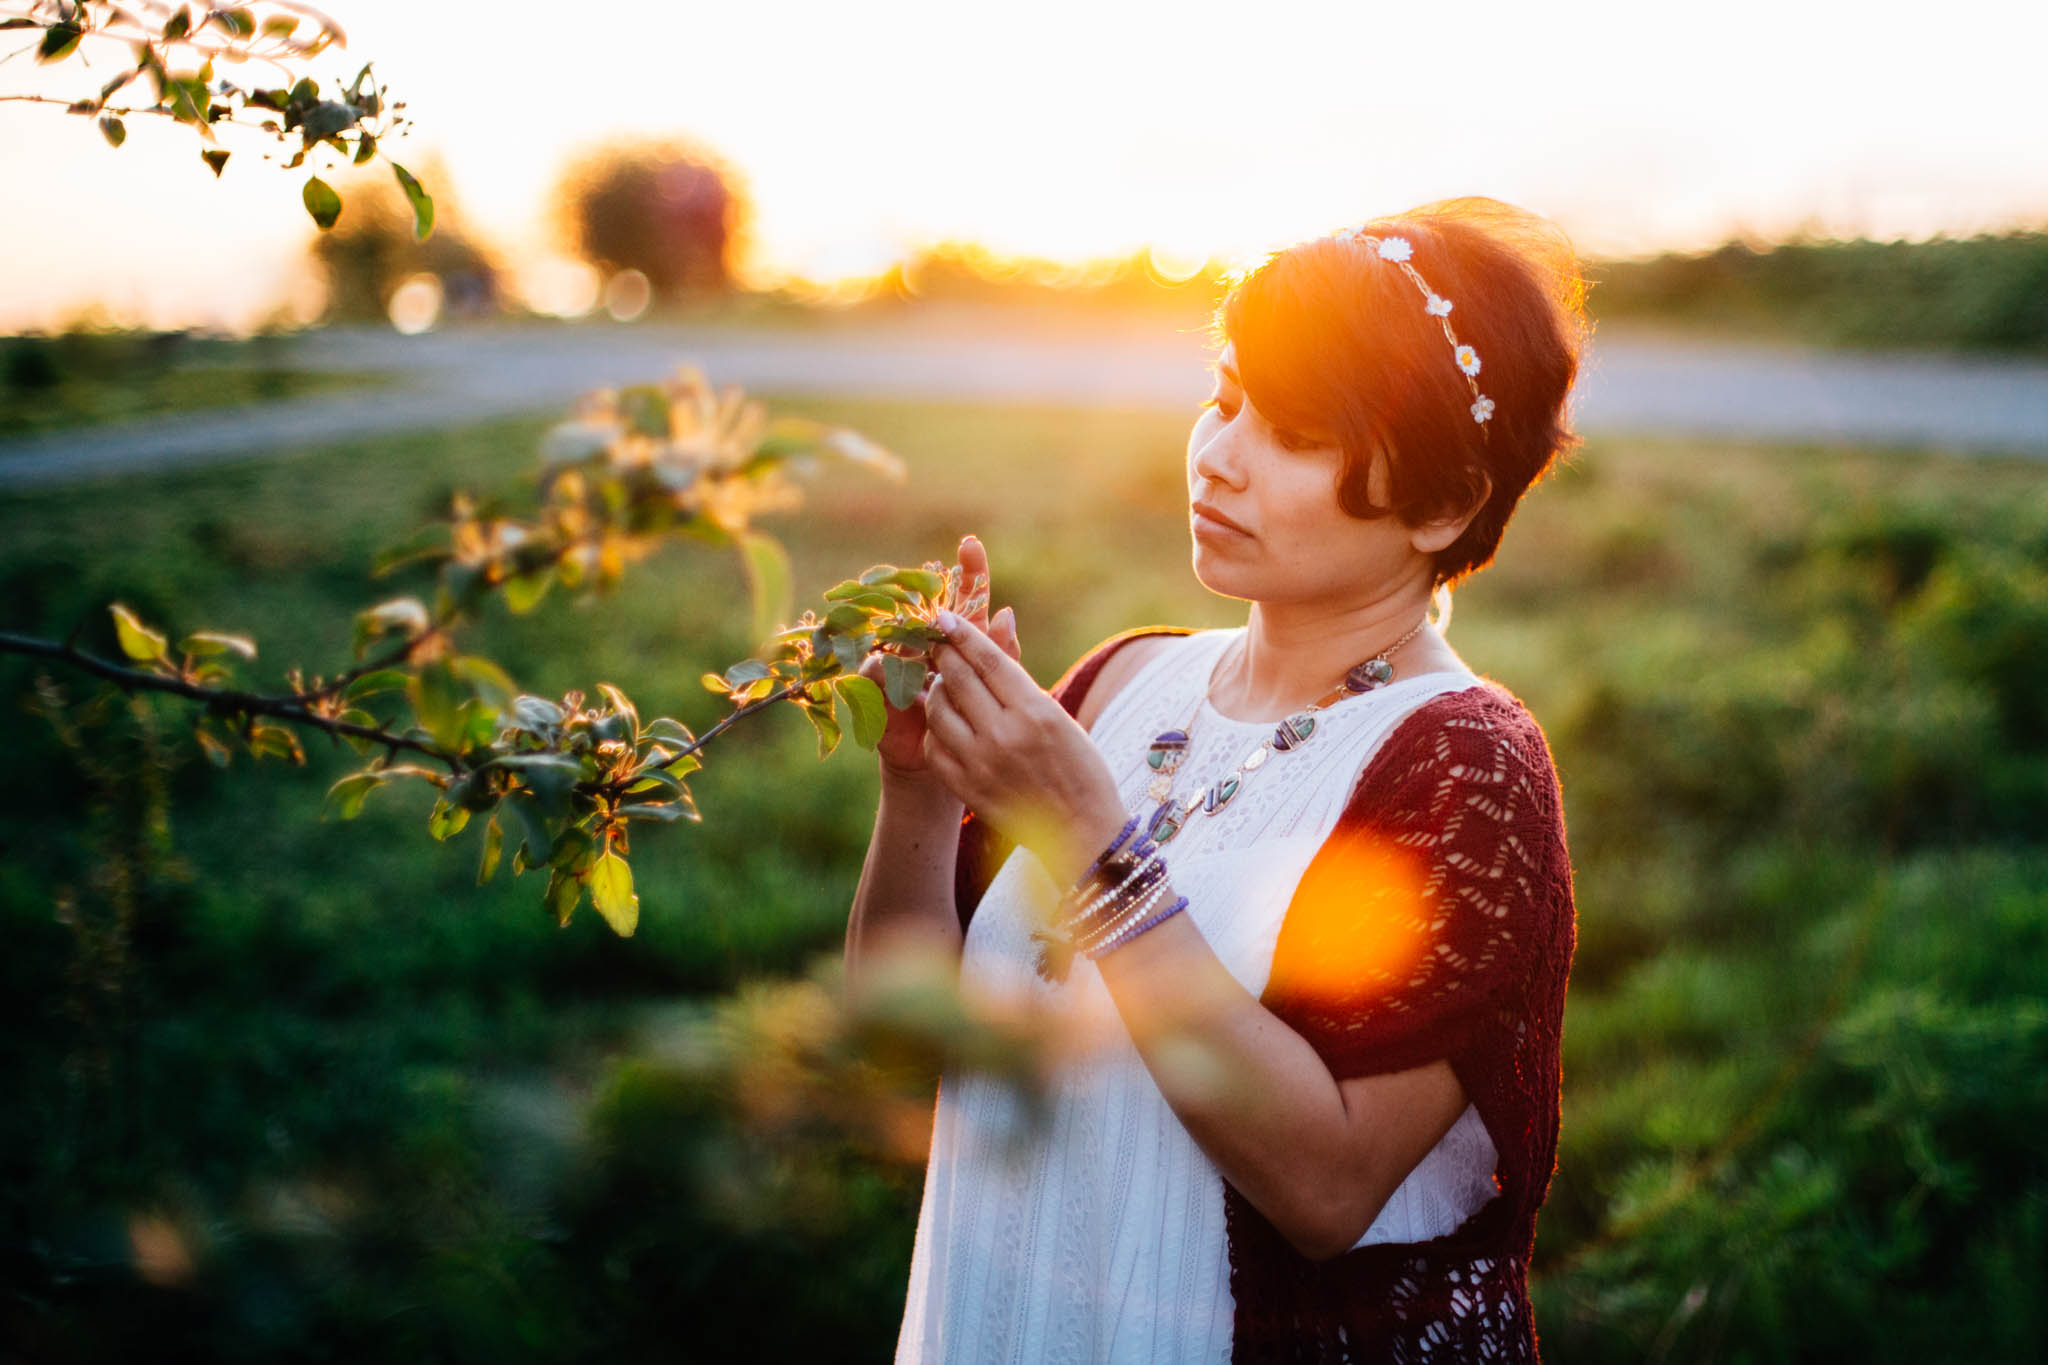 Richmond portrait lifestyle photographer - Emmy Lou Virginia Photography-6.jpg